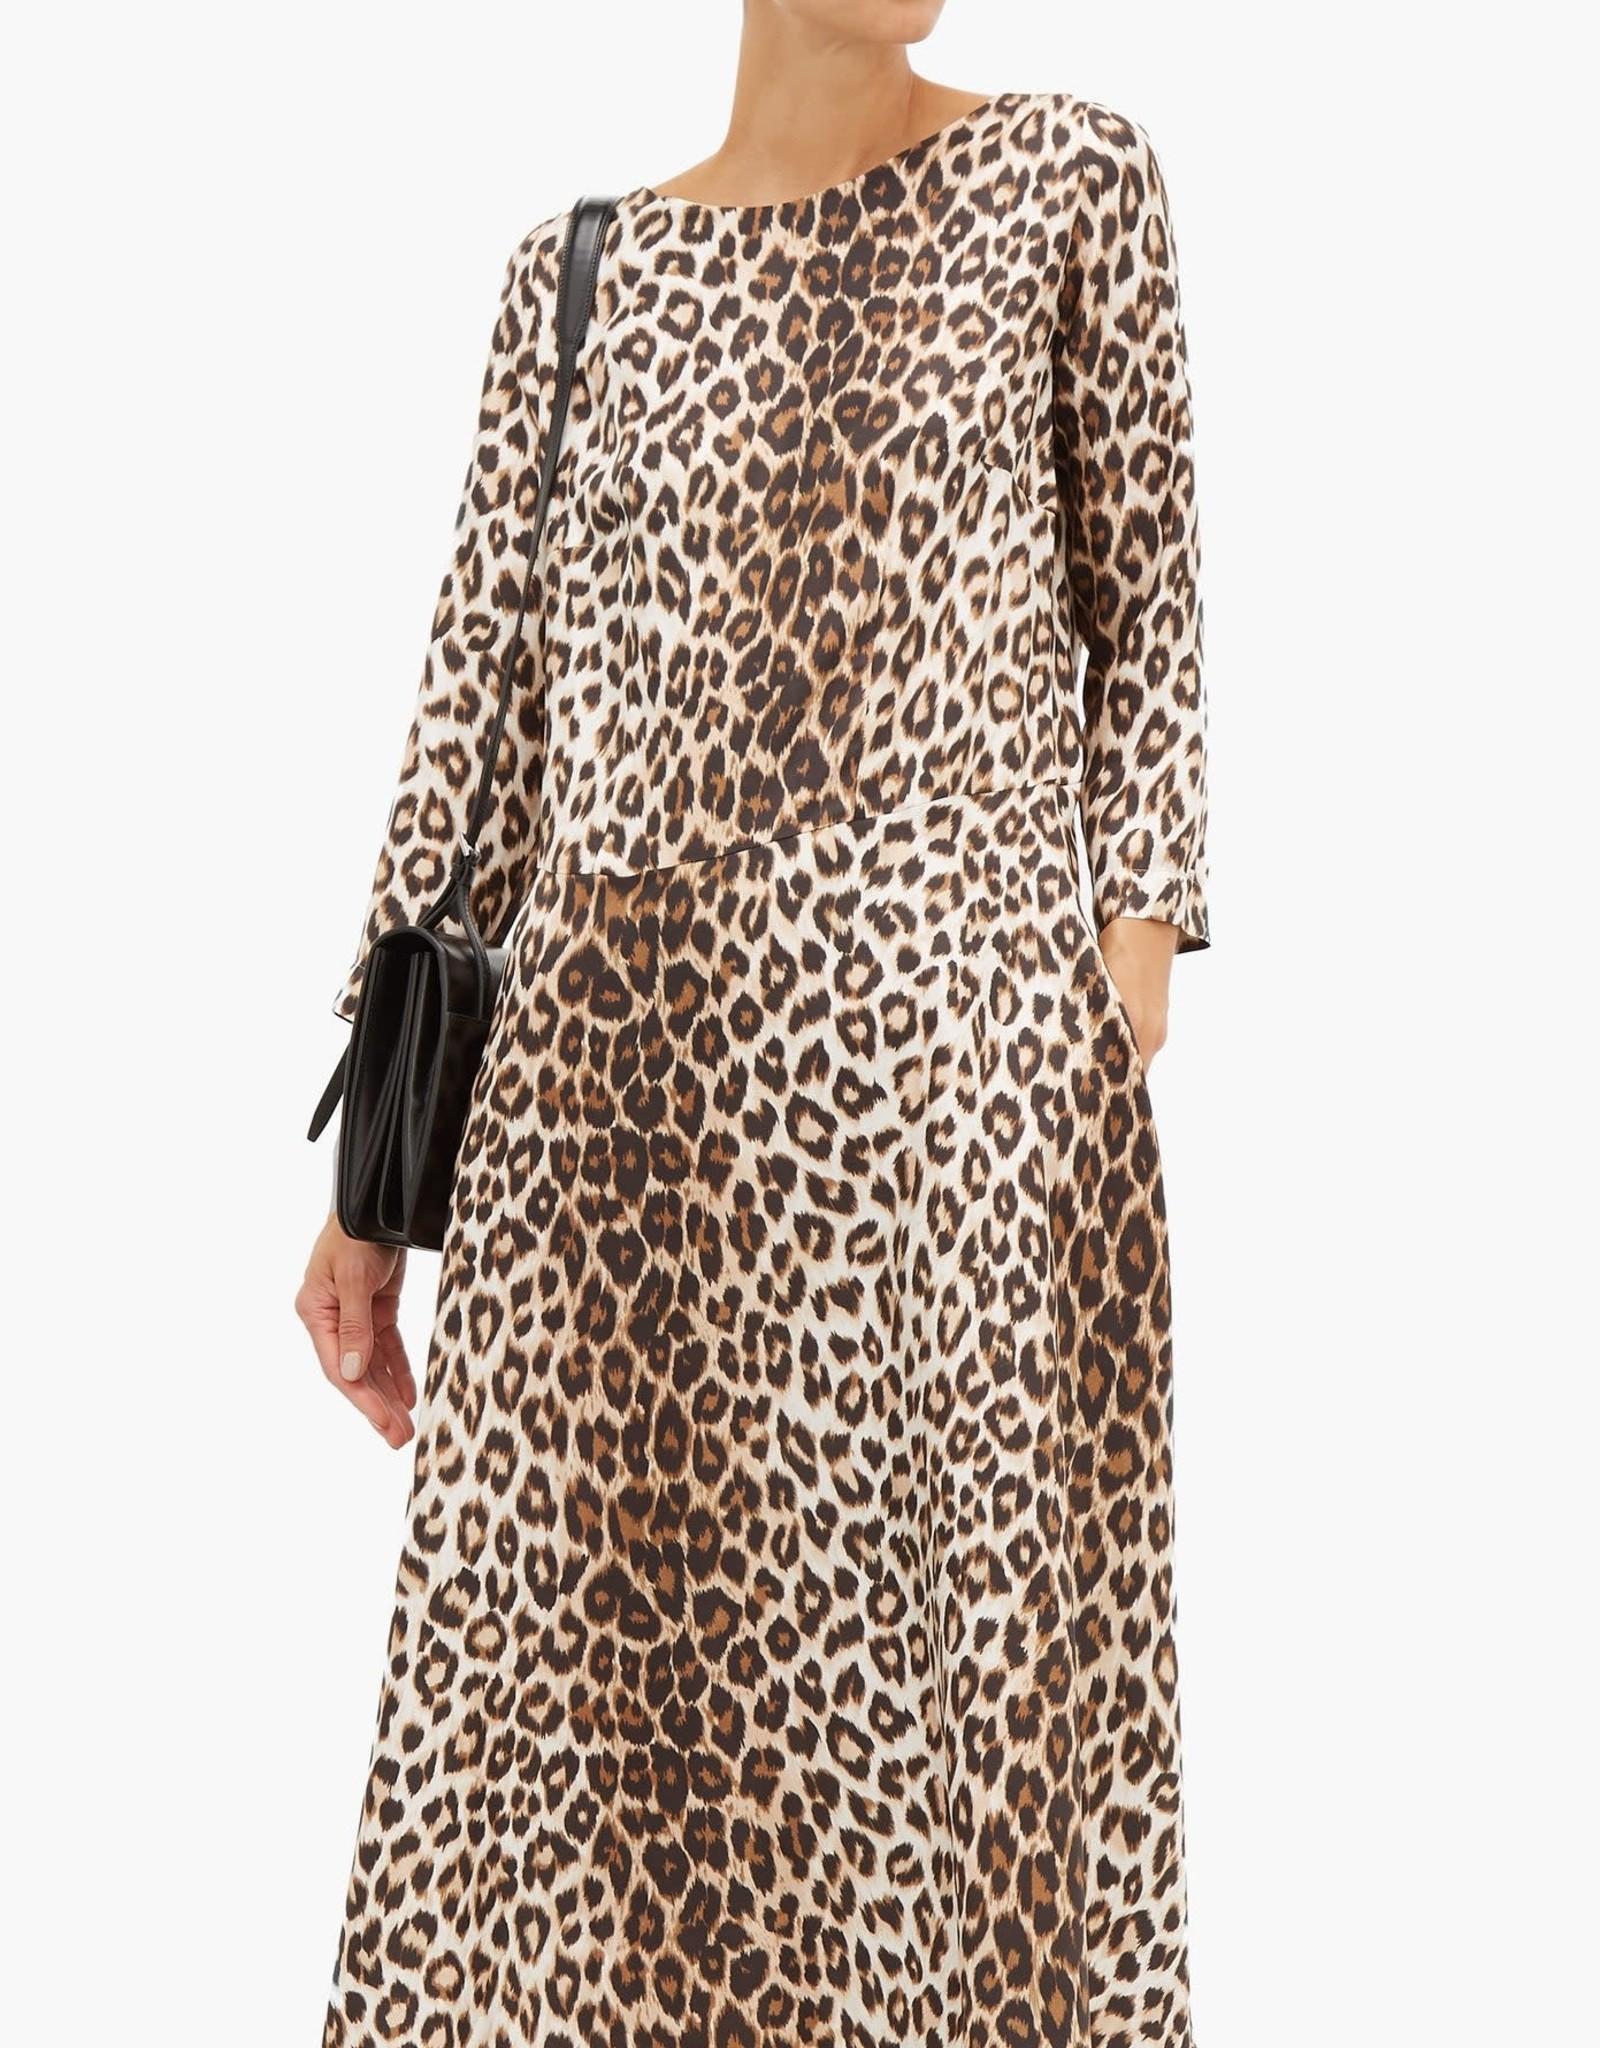 LA PRESTIC OUISTON Drespres Leopard Dress